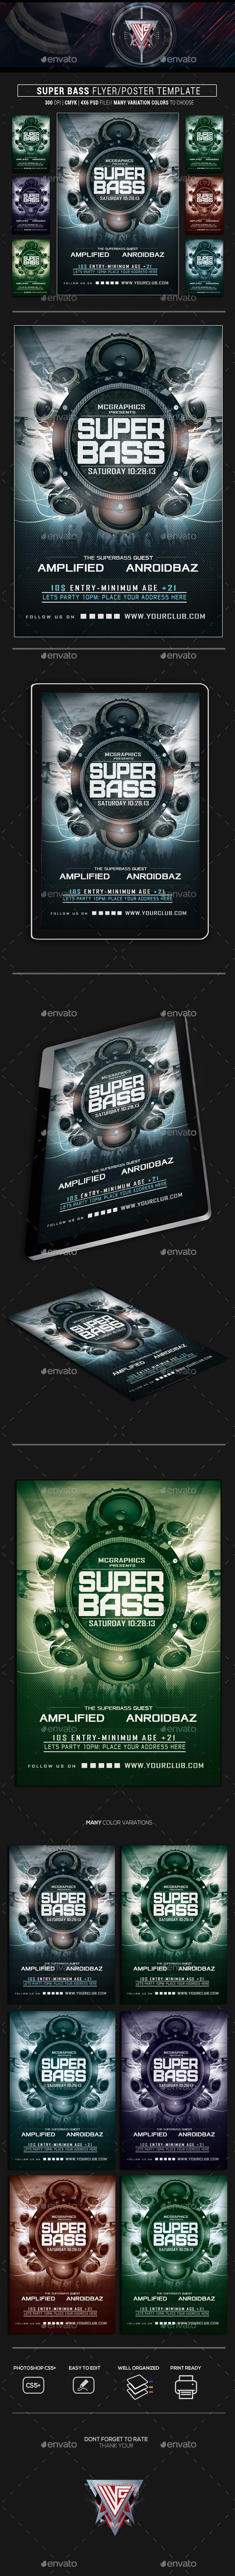 Super Bass Flyer Template - Clubs & Parties Events